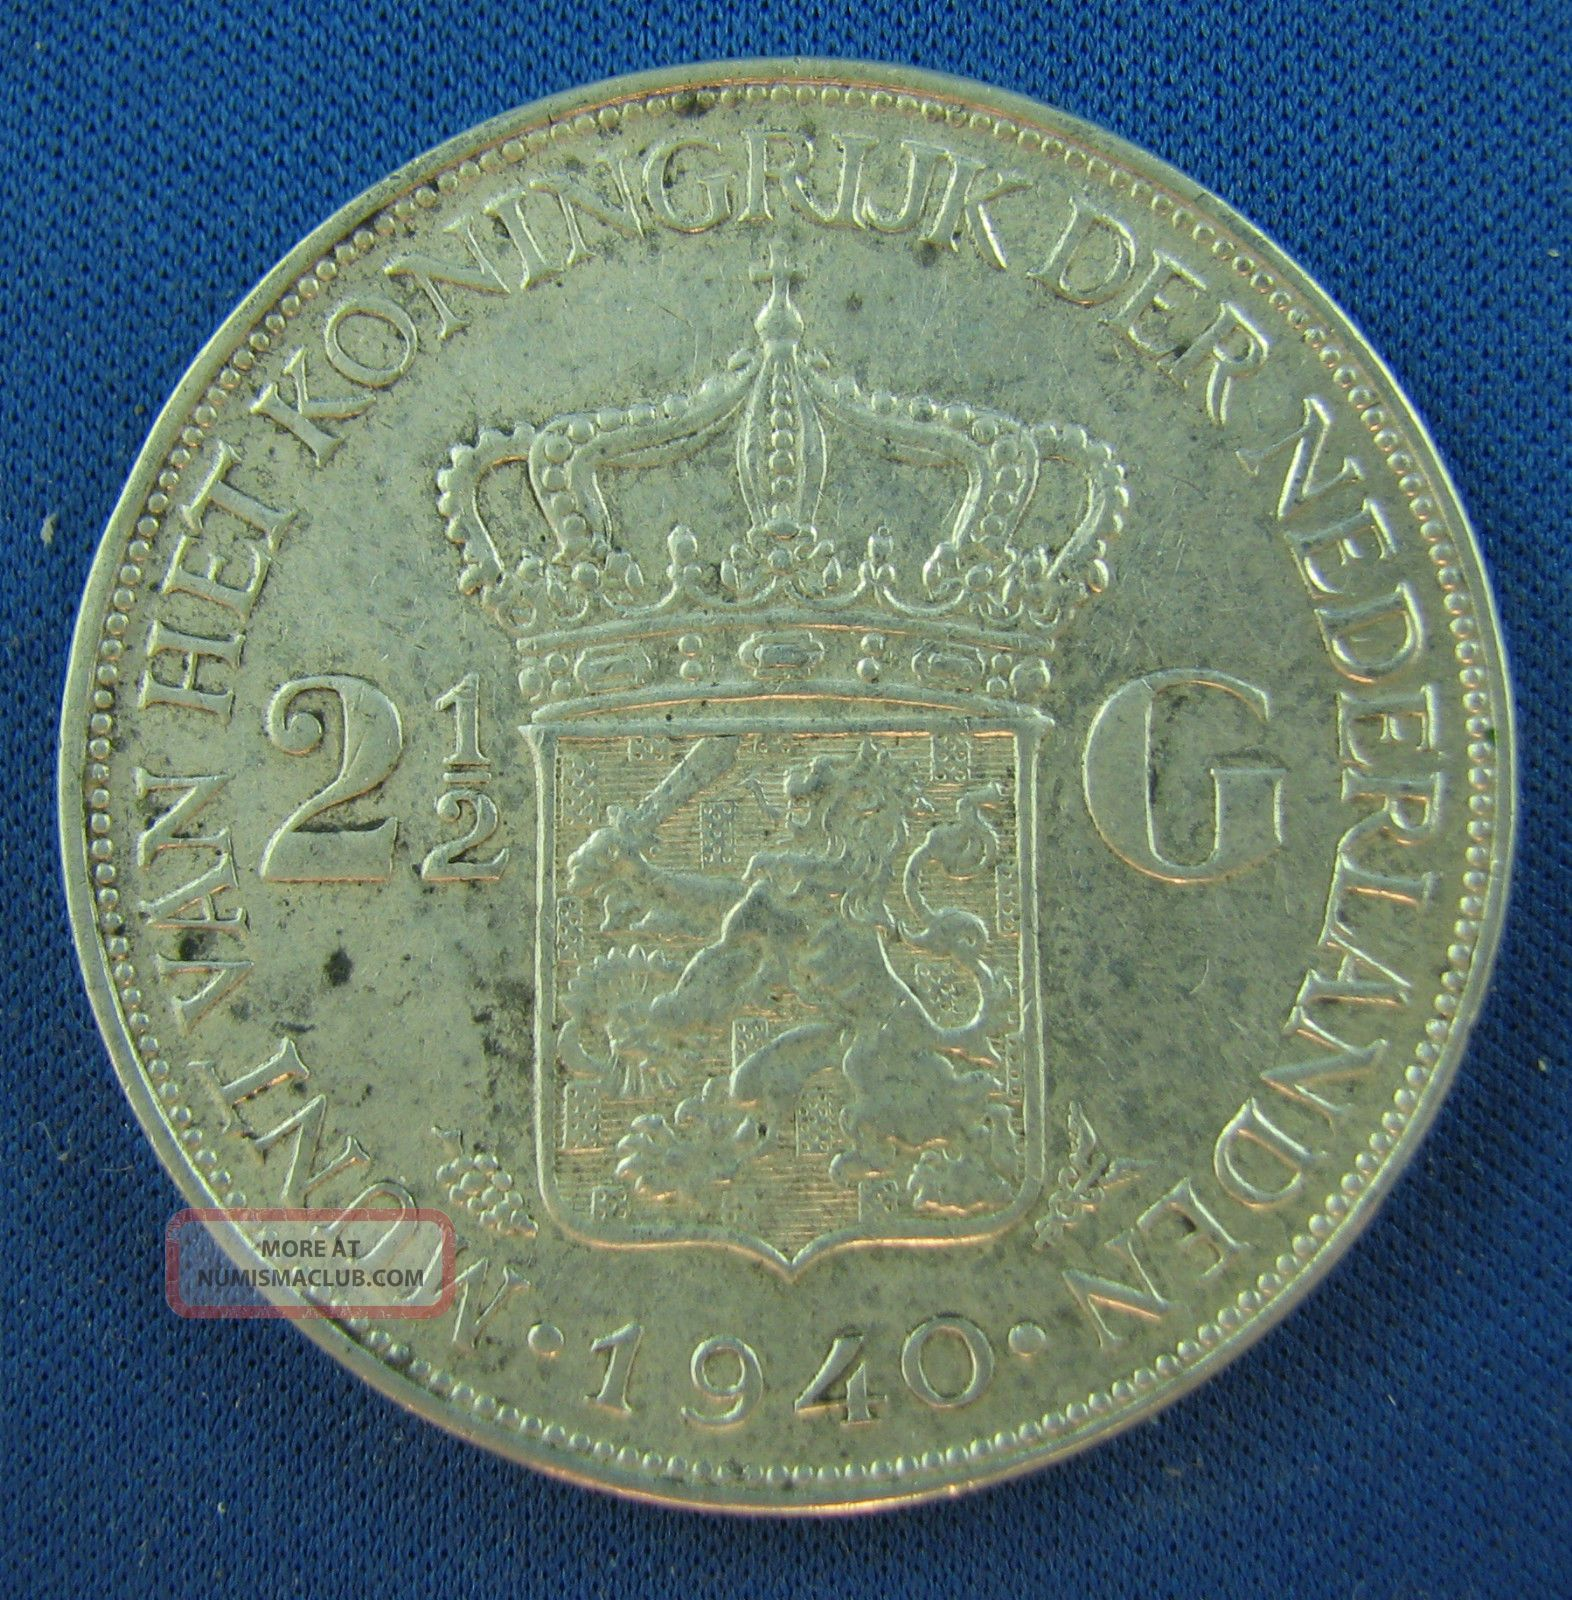 1940 2 1 2 Gulden Netherlands Silver Circulated A Coin